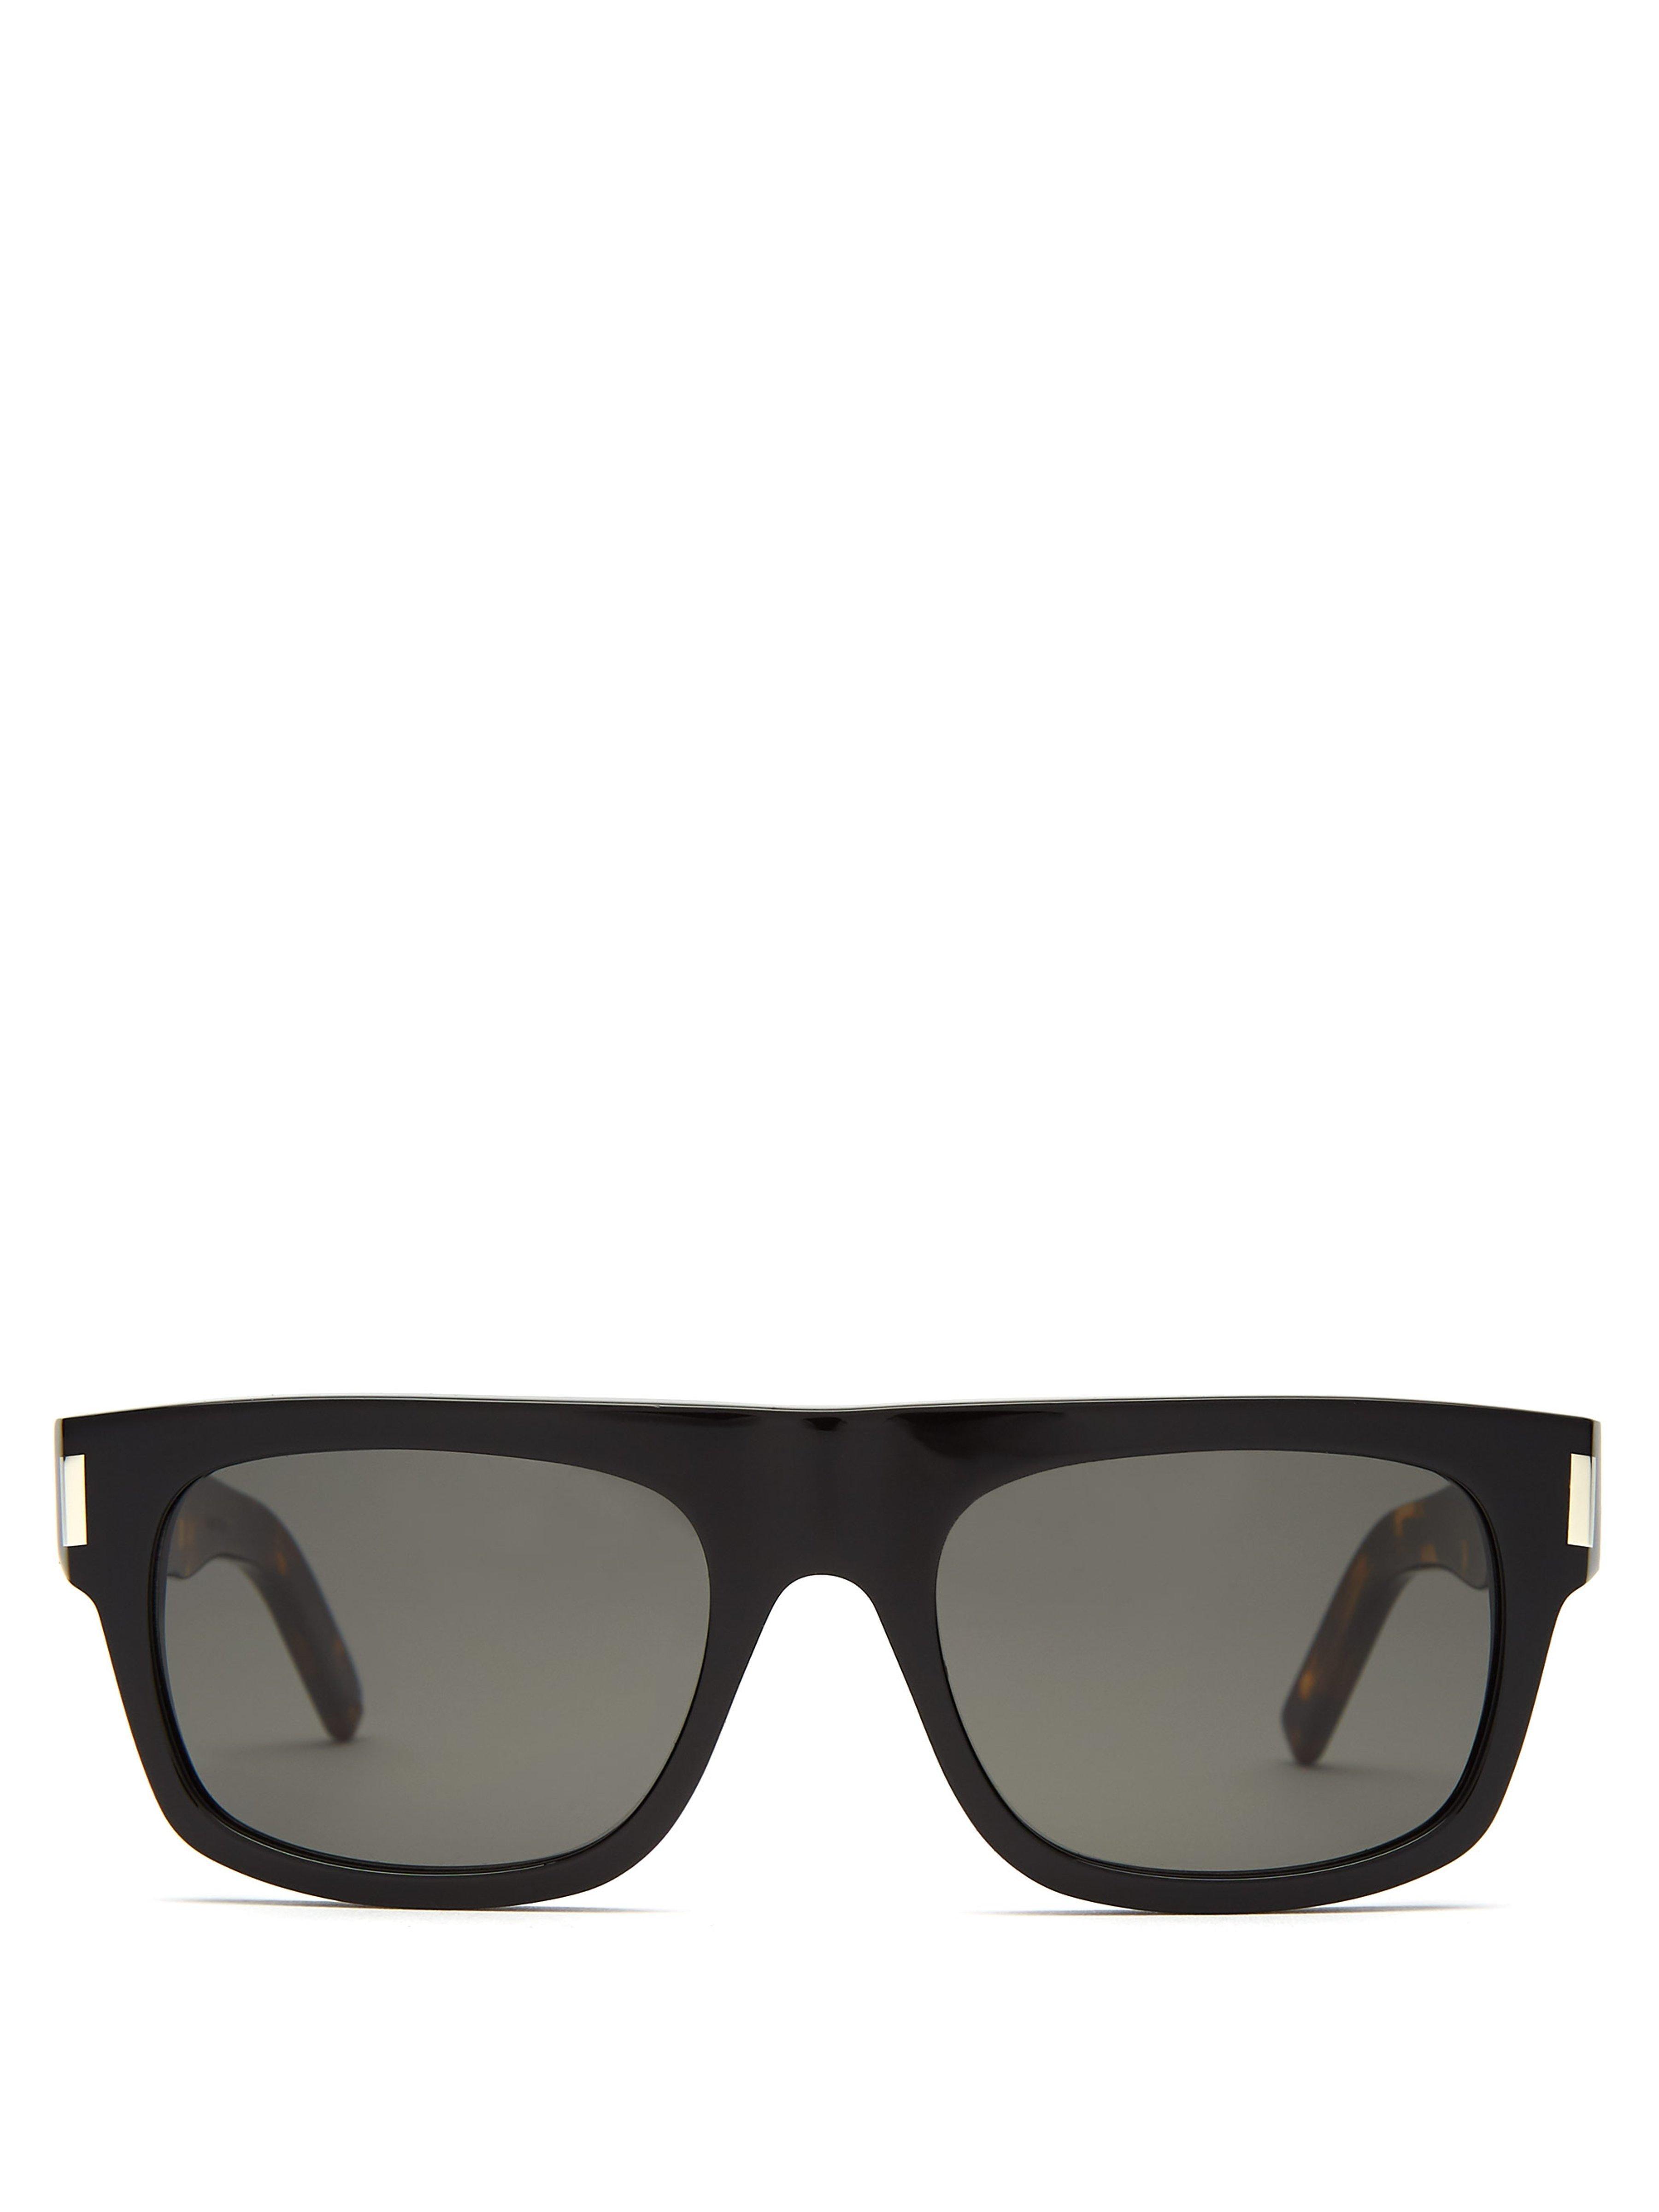 6b95e6e4c3 Saint Laurent Square Frame Acetate Sunglasses in Black for Men - Lyst